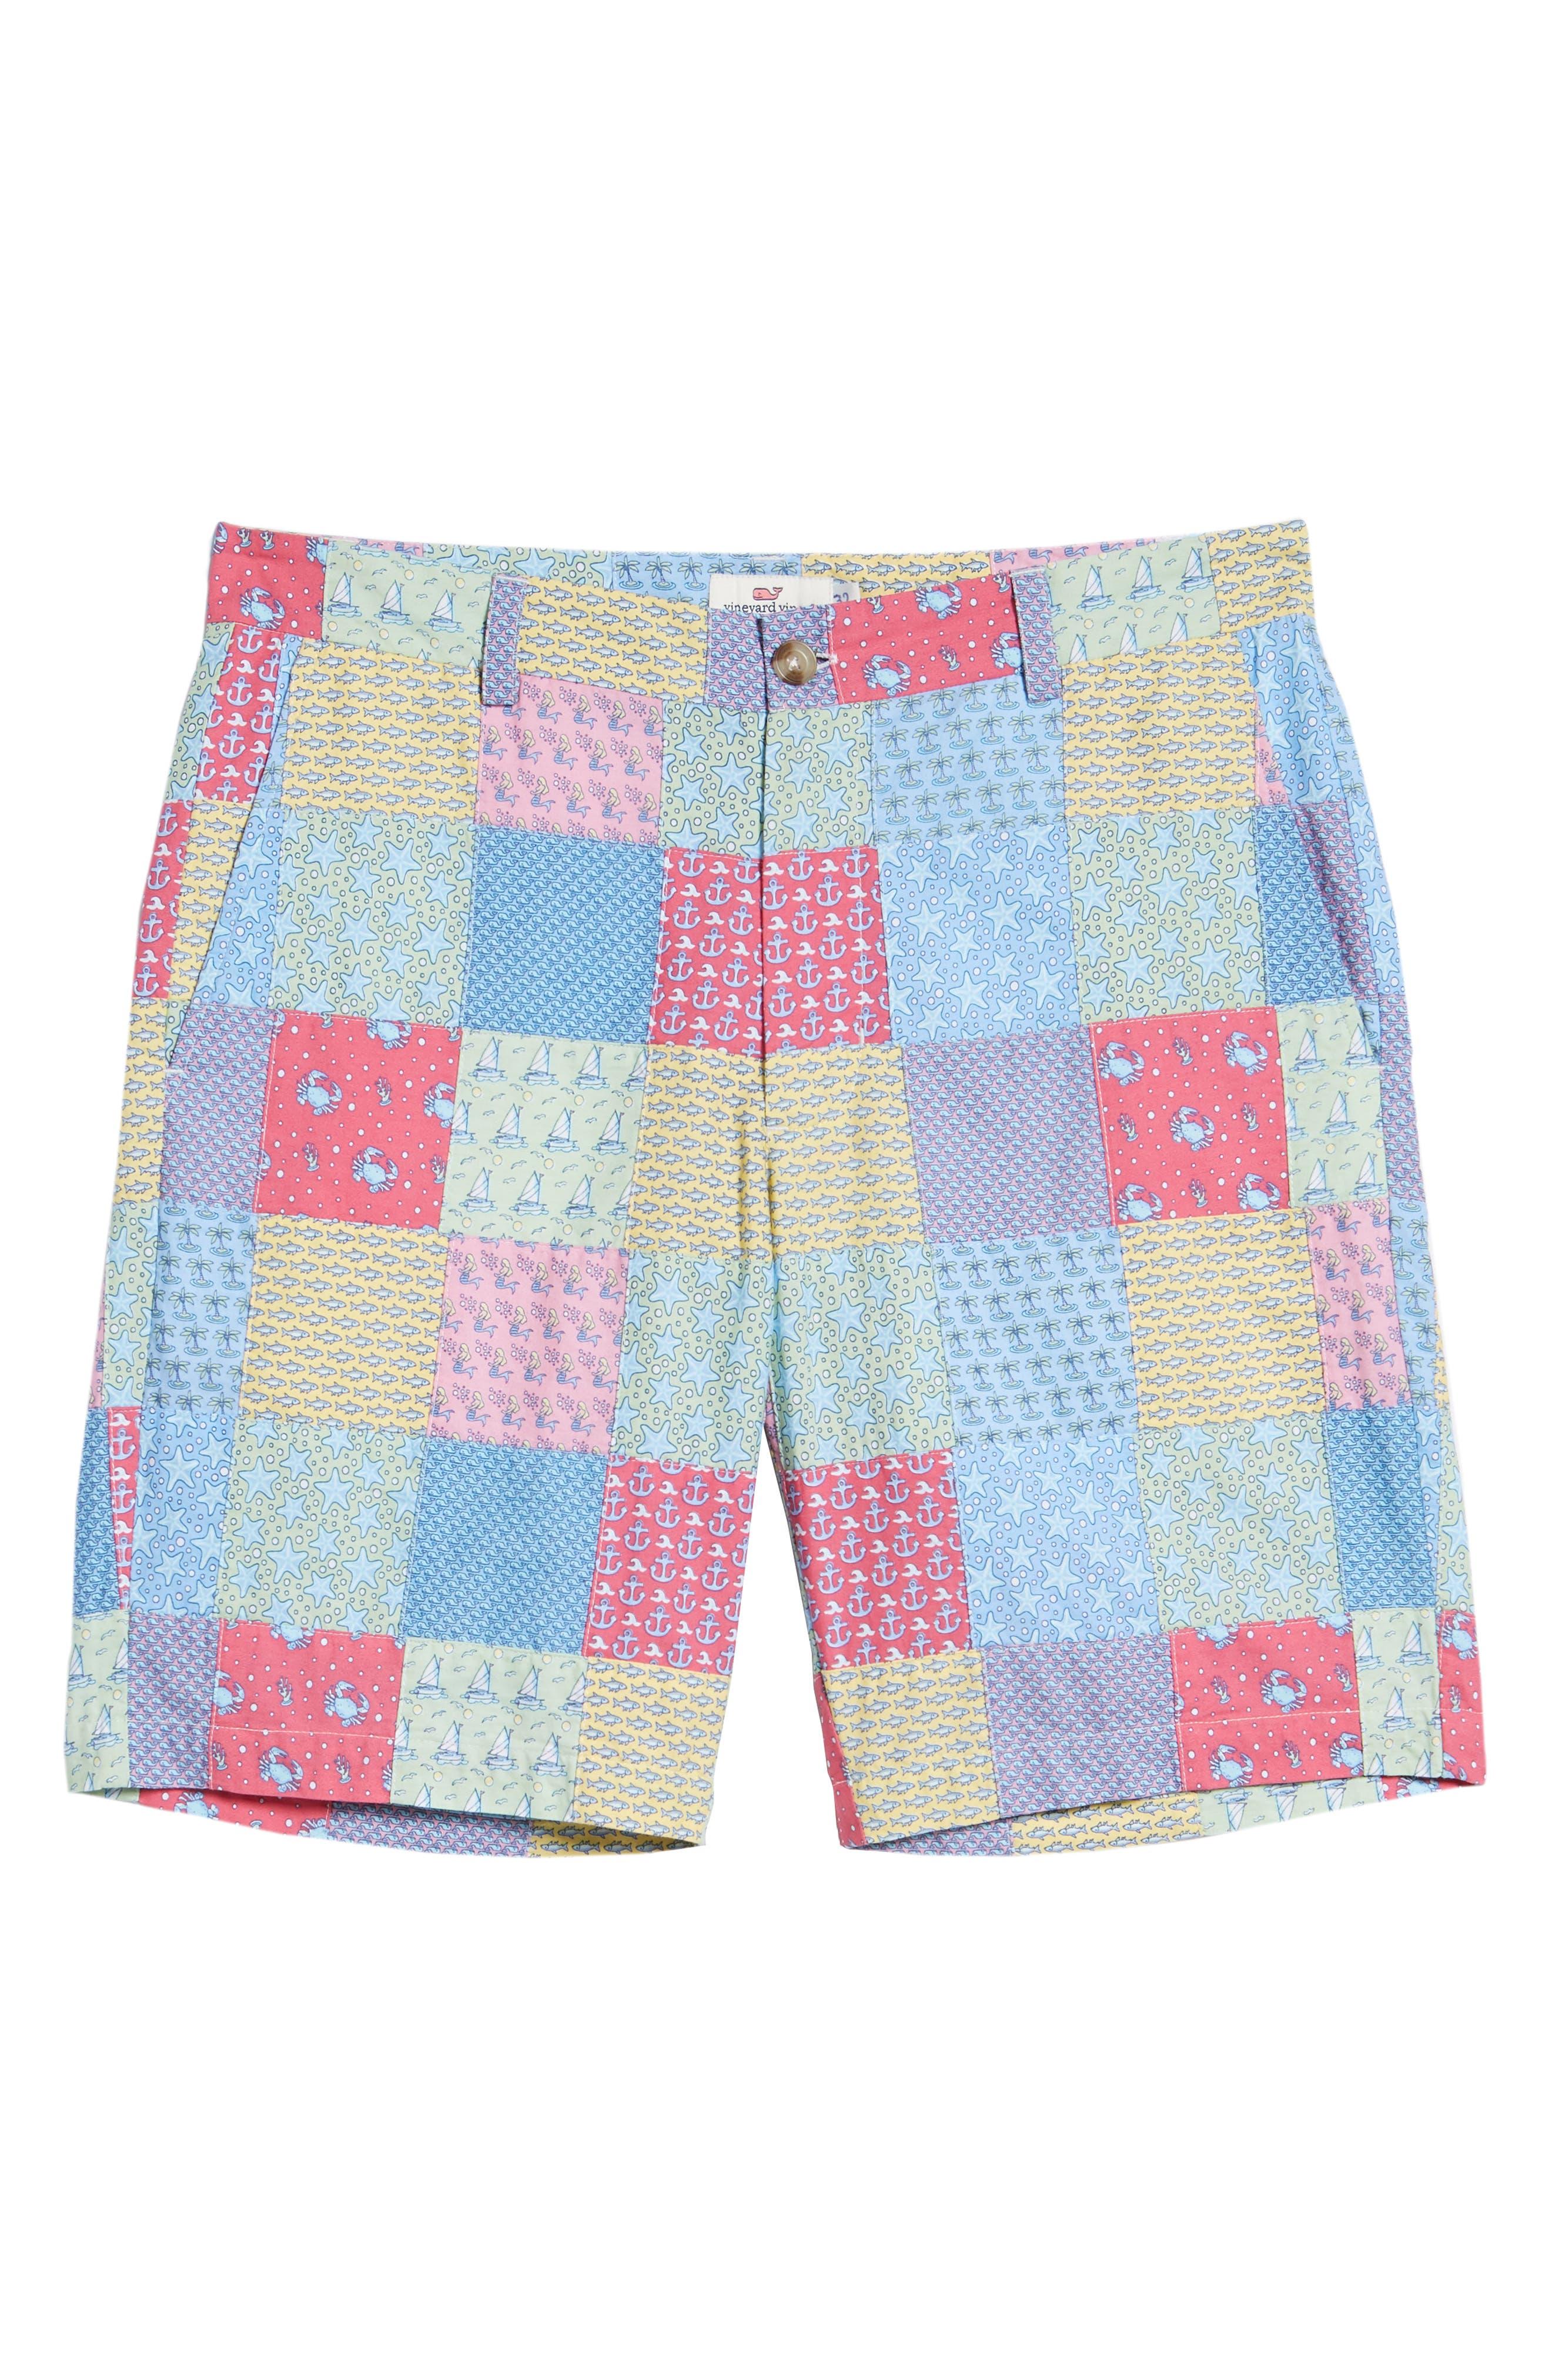 Patchwork Breaker Shorts,                             Alternate thumbnail 6, color,